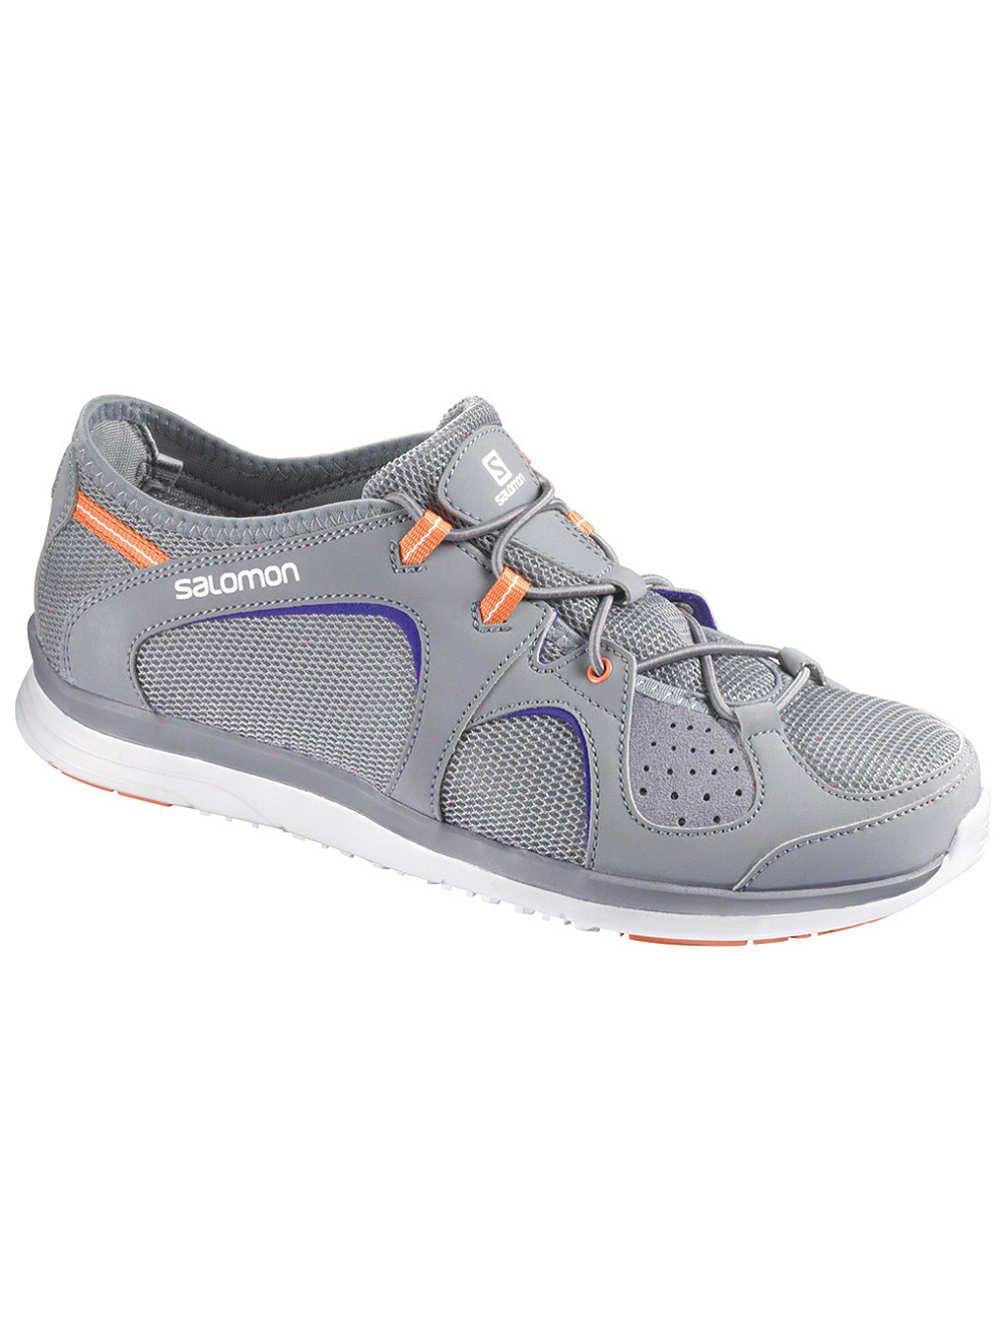 Salomon Damen Sneaker Cove Light Sneakers Pearl Grau/Spectrum Grau/Spectrum Pearl Blau/ b28e1c